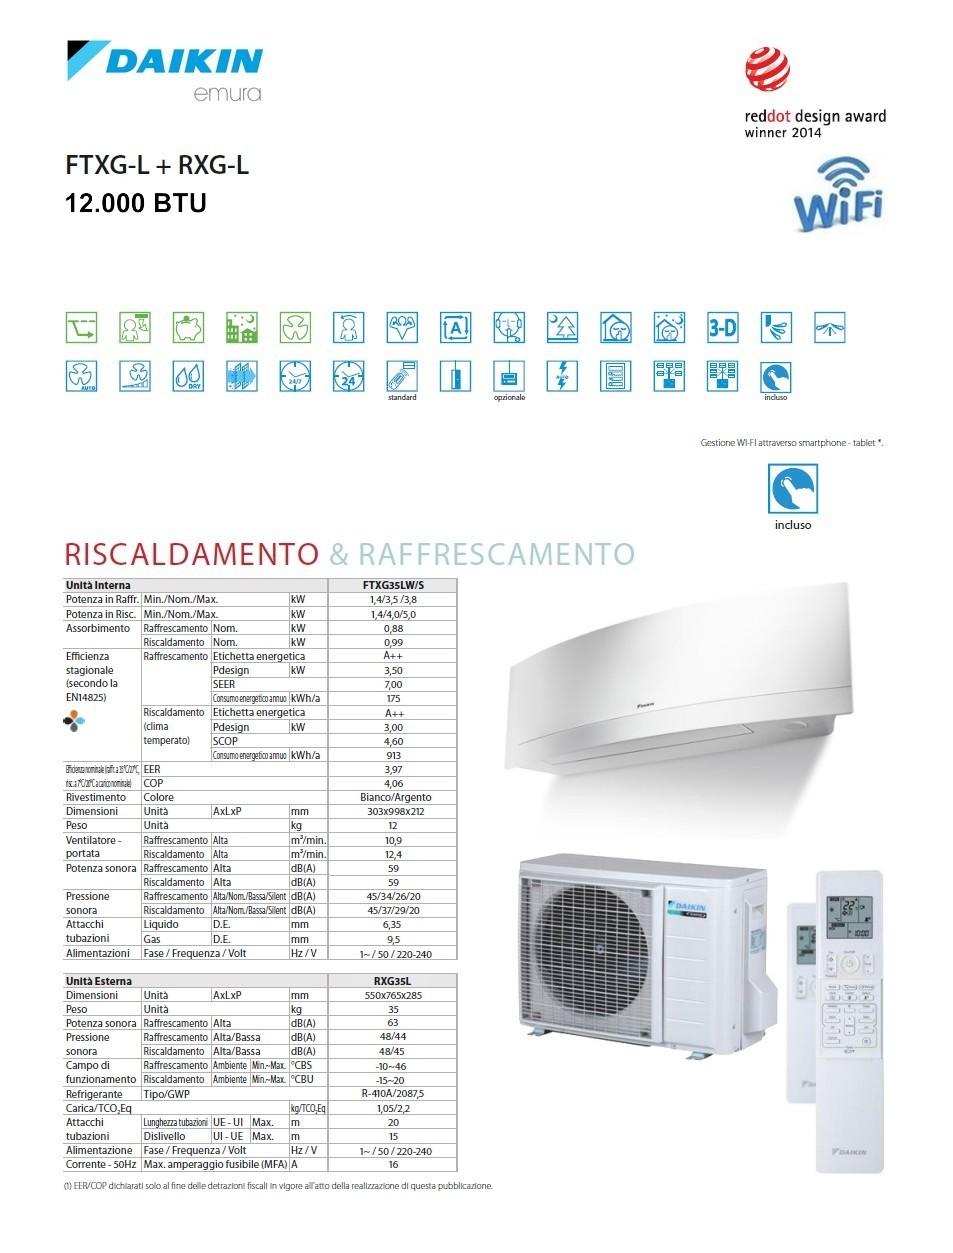 Condizionatore daikin emura bianco 12000 btu inverter a - Unita esterna condizionatore dimensioni ridotte ...